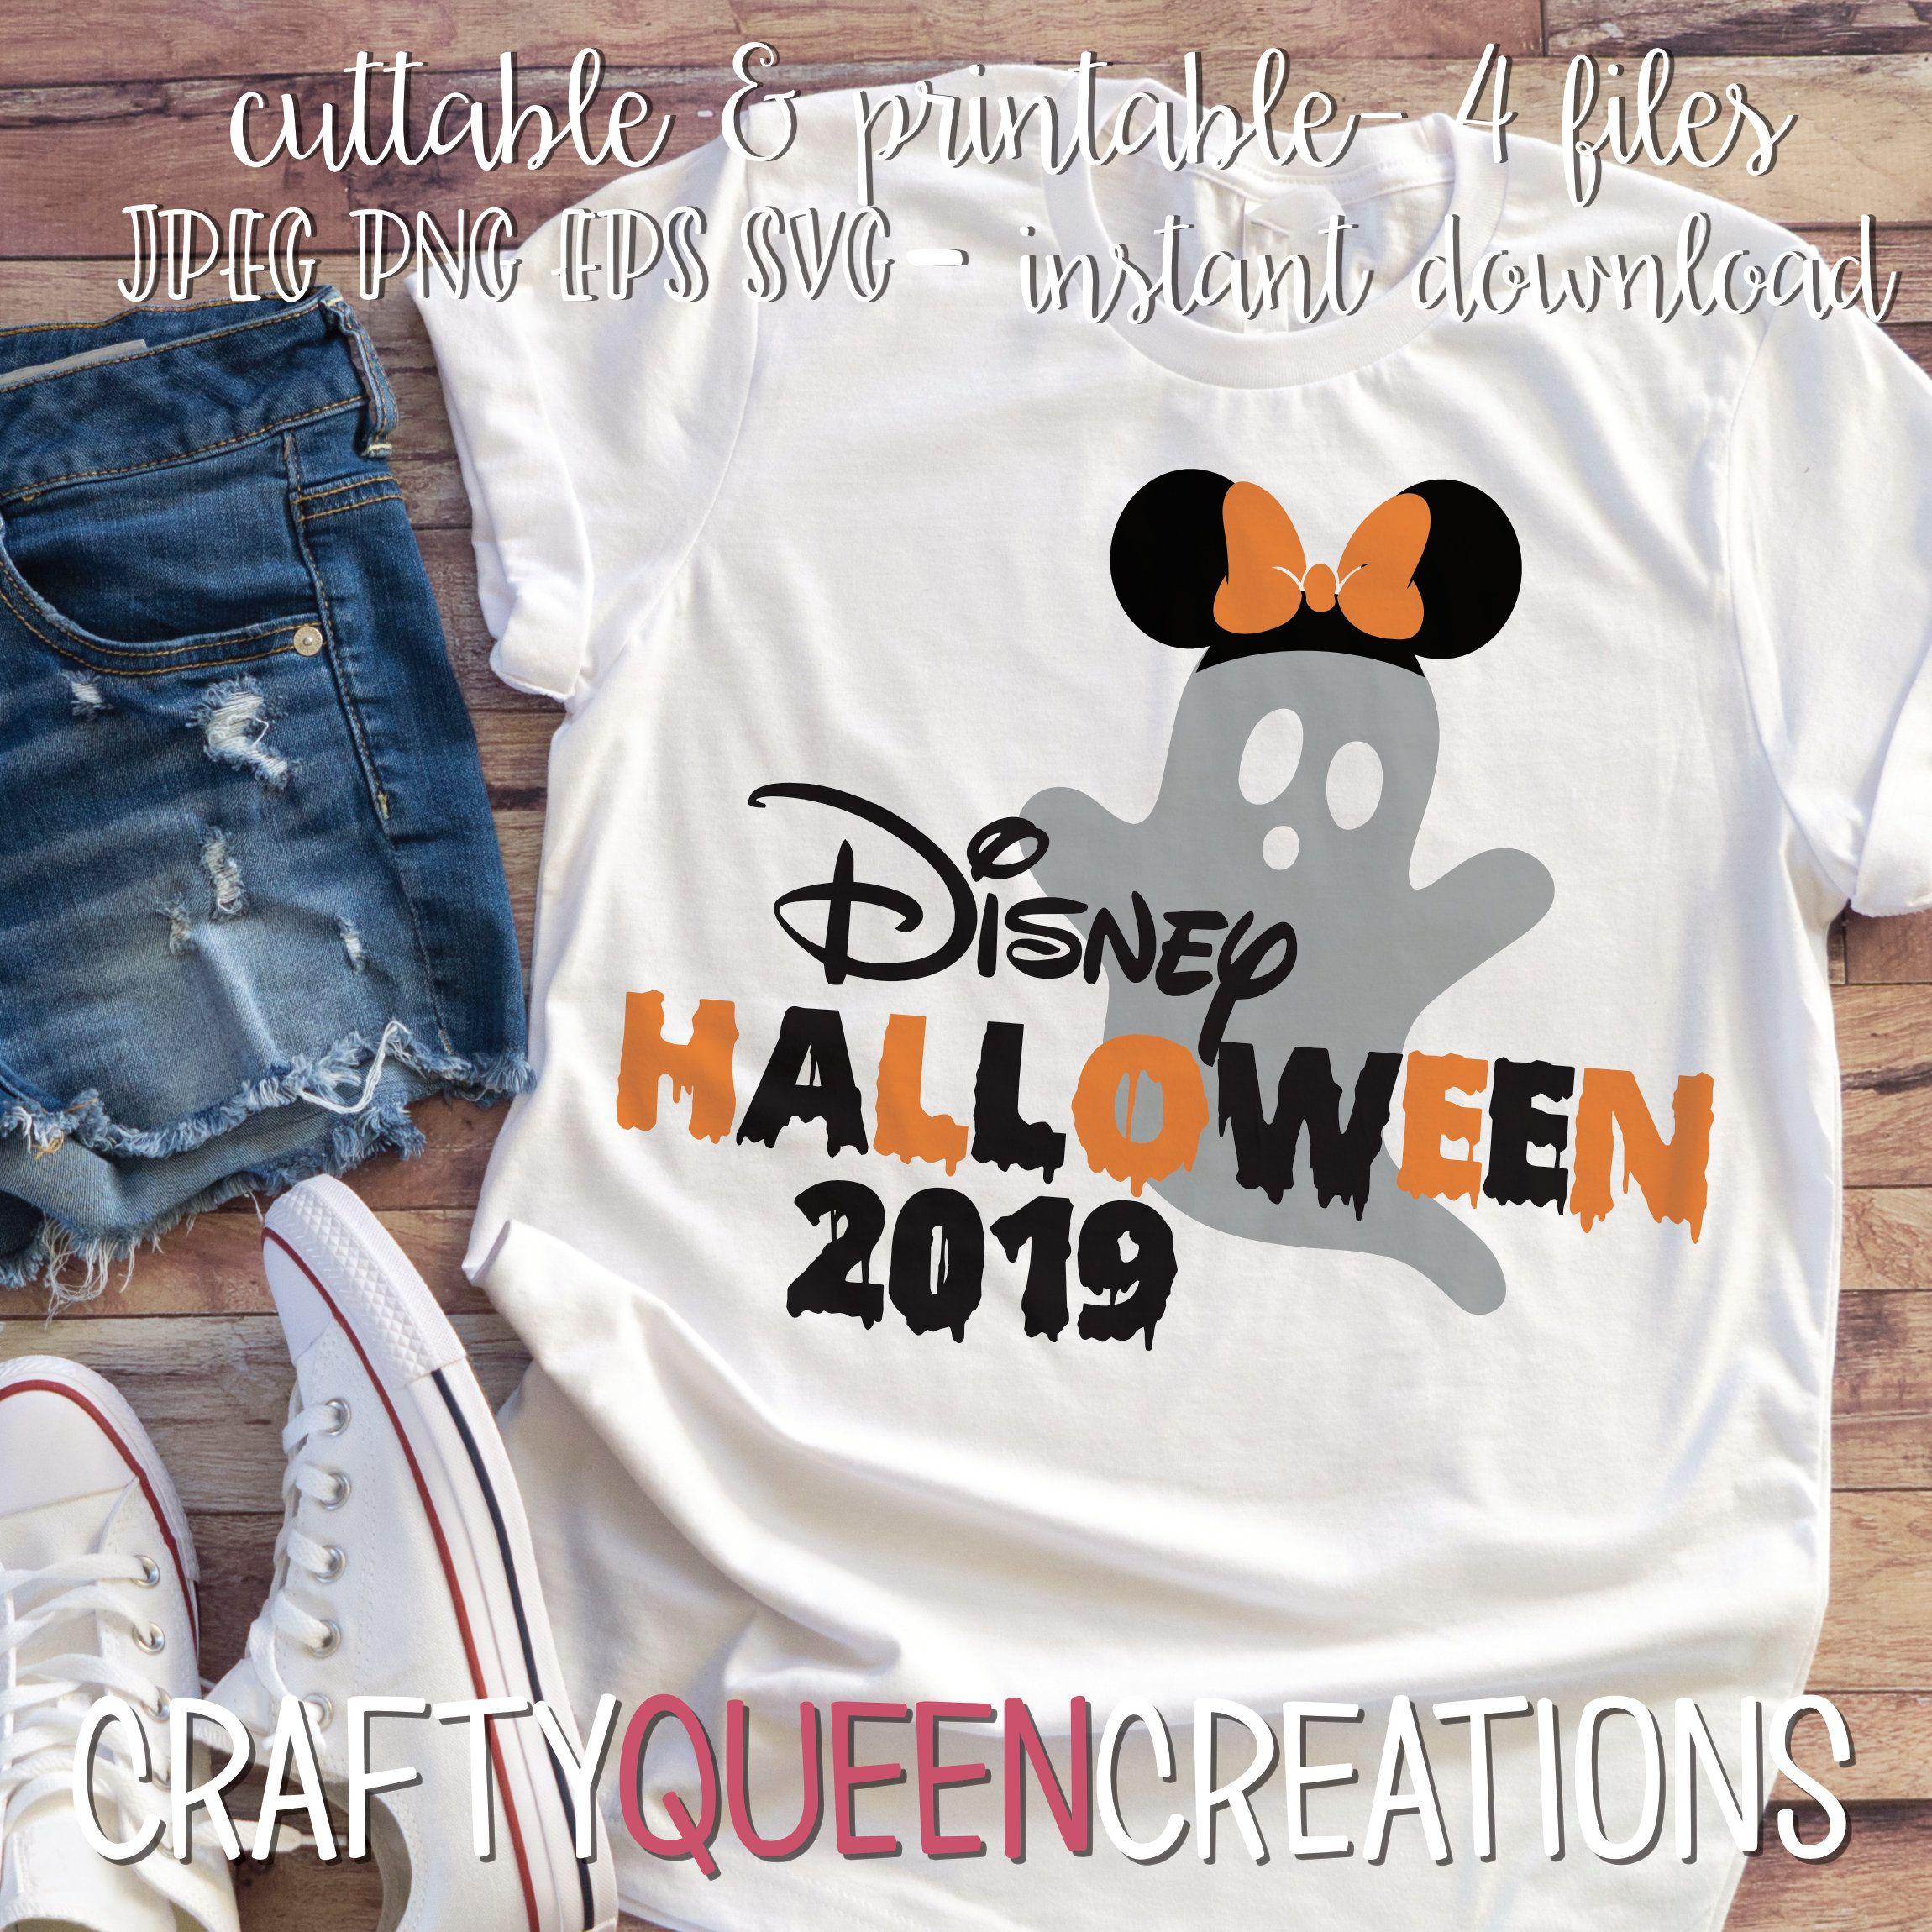 Disney Halloween 2019 SVG Disney halloween, Halloween